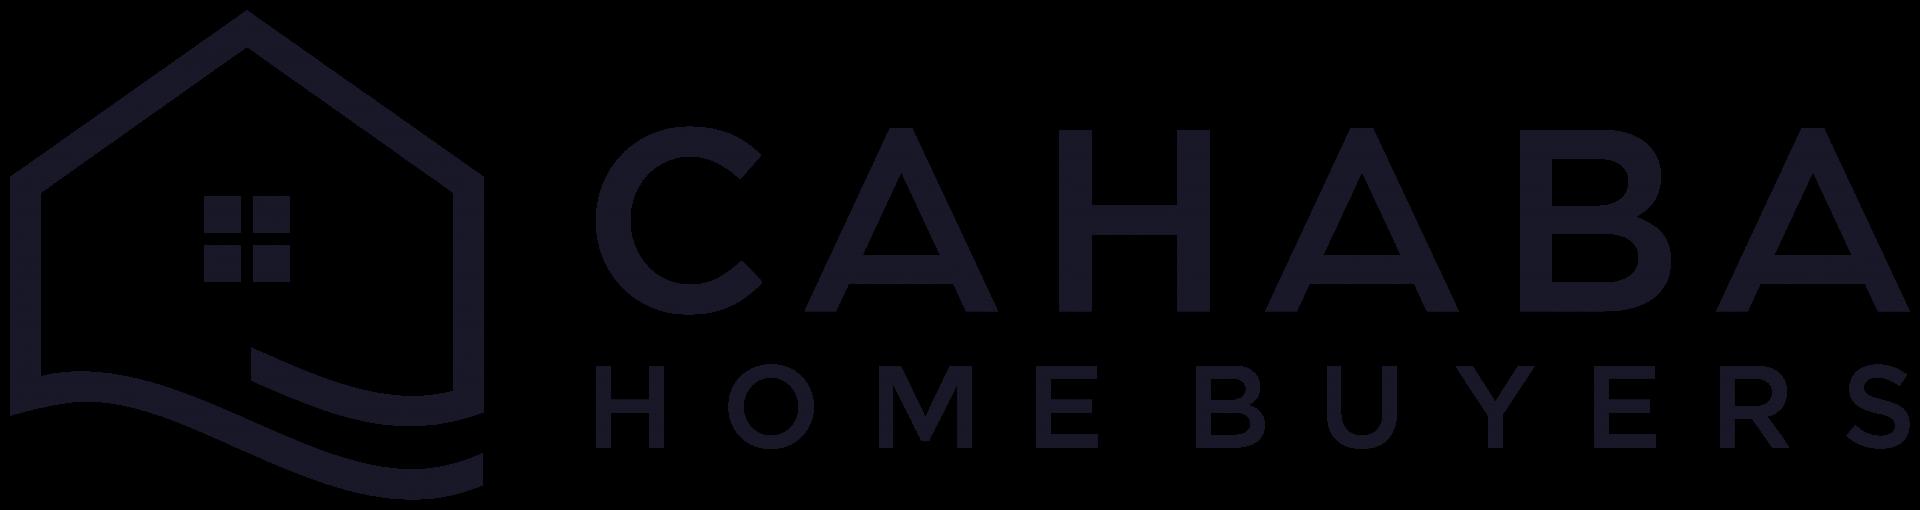 Cahaba Home Buyers logo